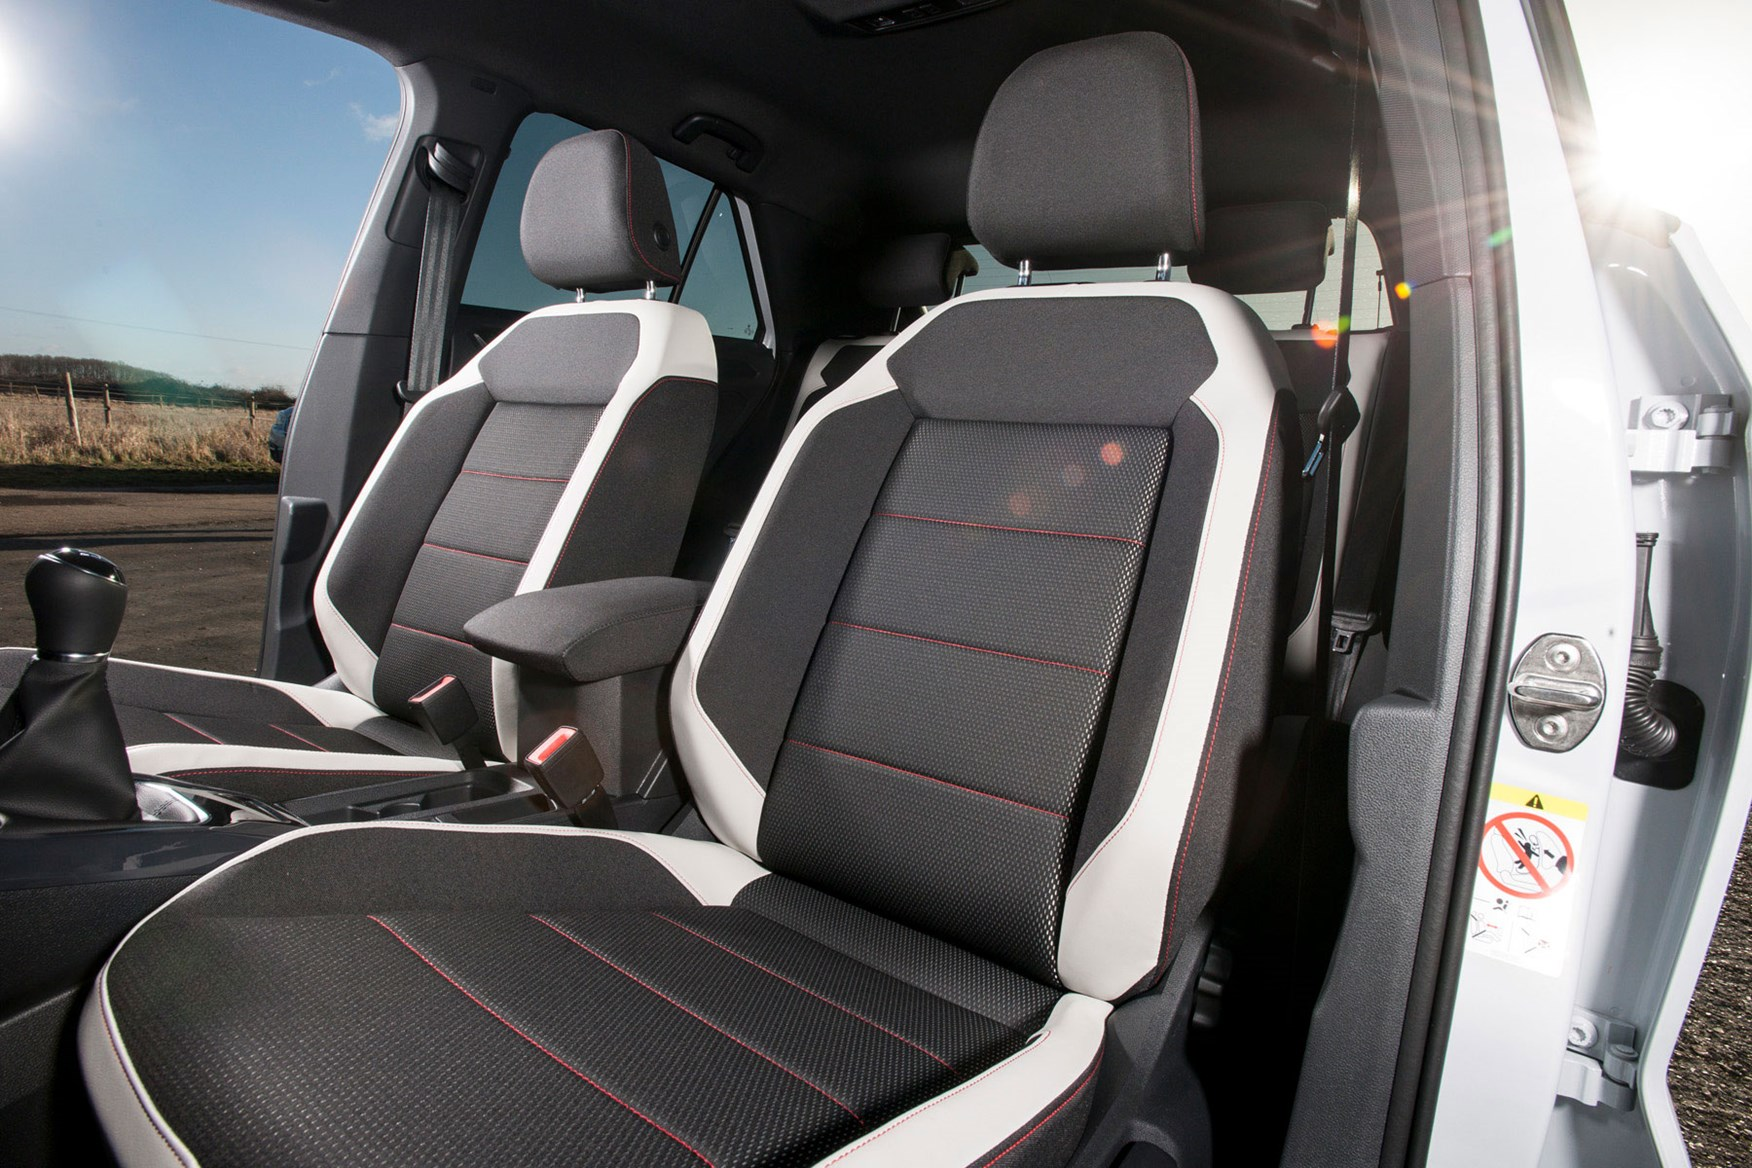 Used Vw Vans For Sale >> VW T-Roc vs Audi Q2 vs MINI Countryman   Parkers